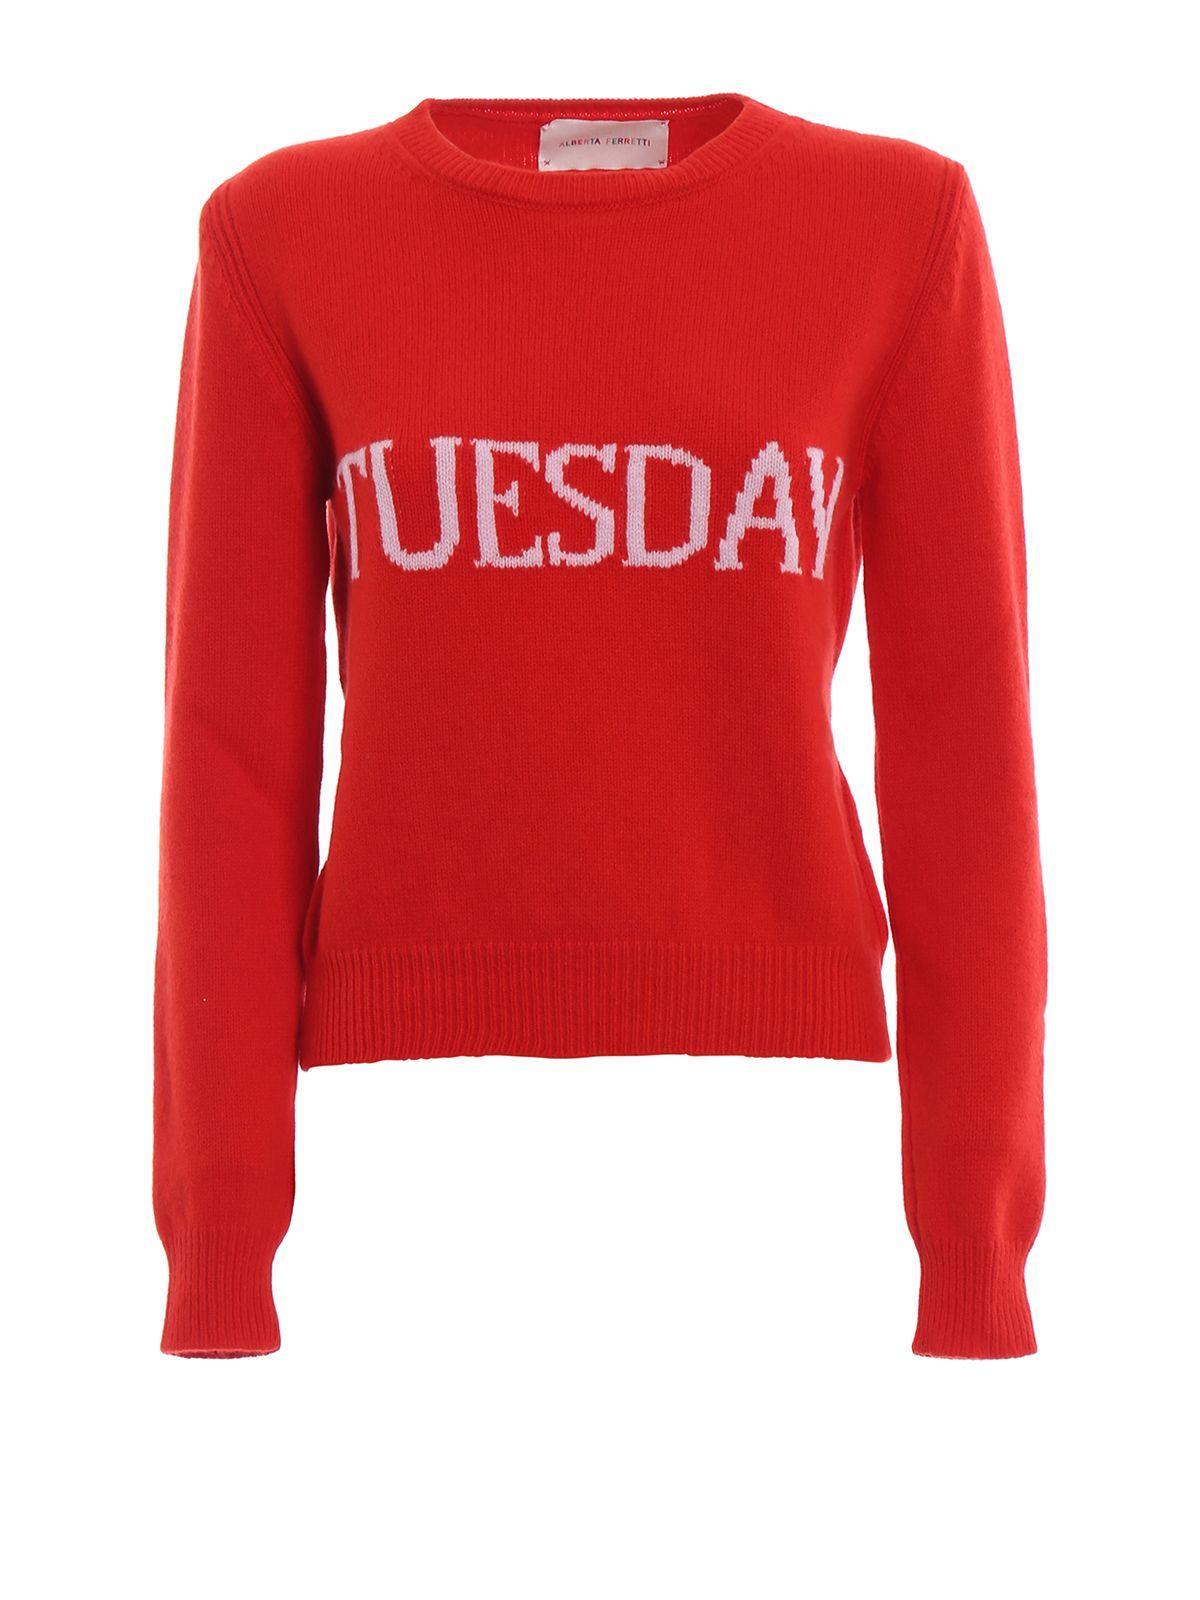 Alberta Ferretti Tuesday Red Knitted Crewneck